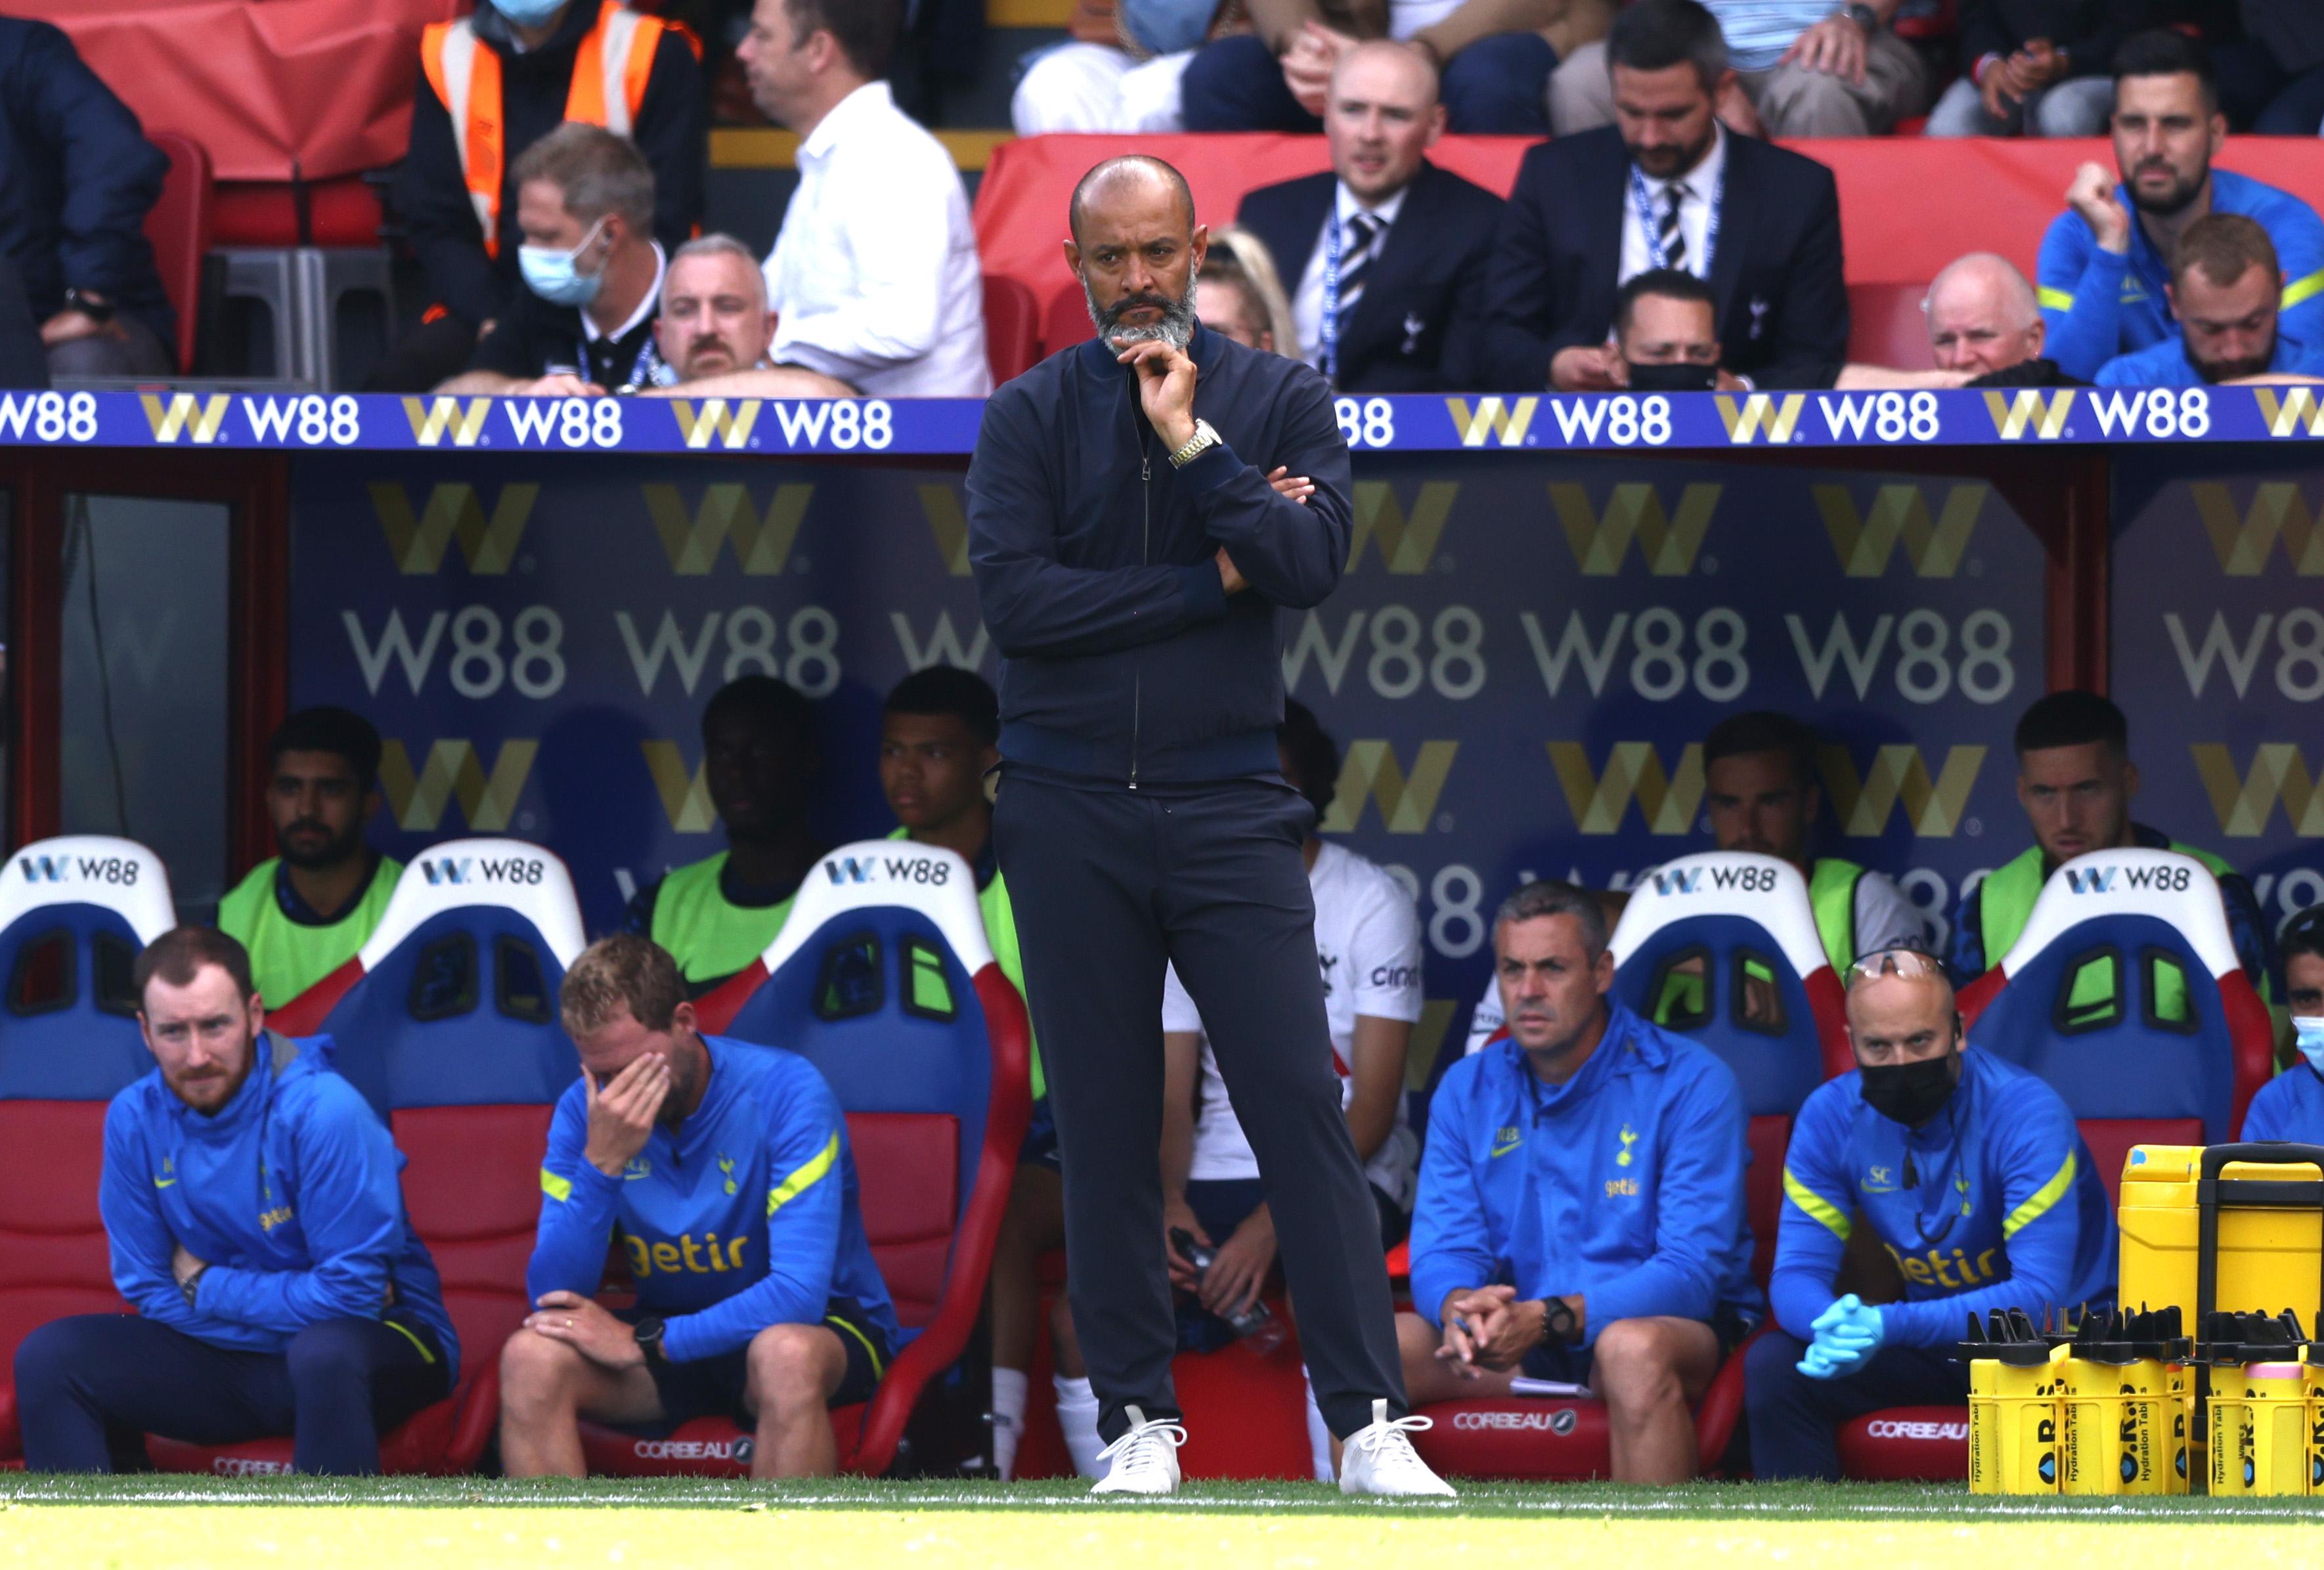 Crystal Palace v Tottenham Hotspur - Premier League